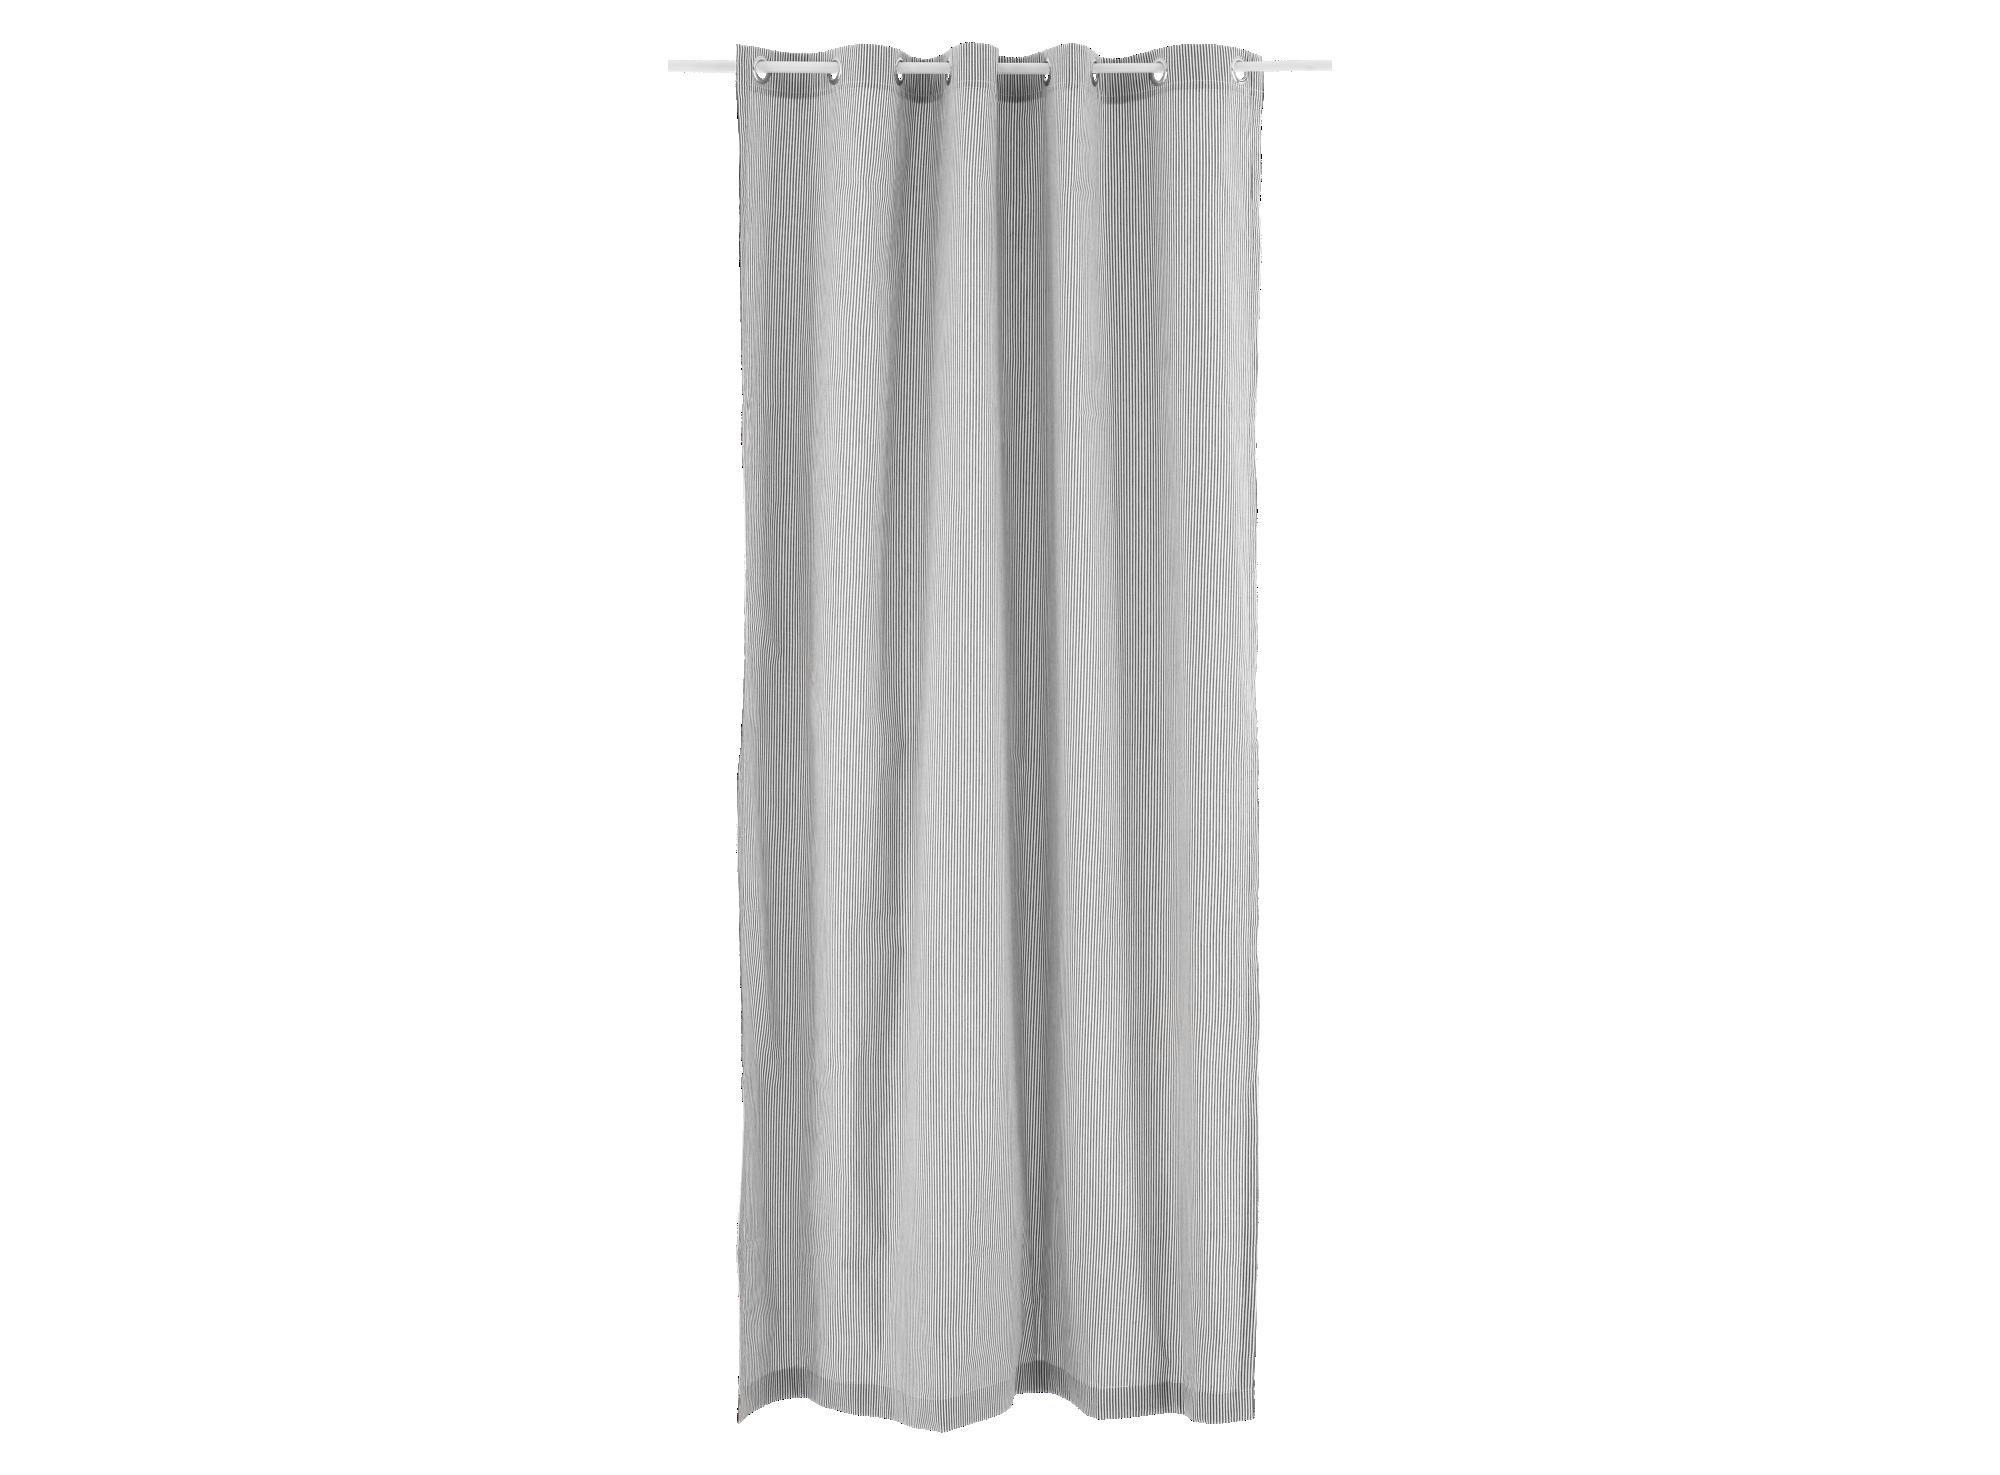 Rideau 140x240 revetu 100% coton garni 100% polyester coloris ivoire/ ...